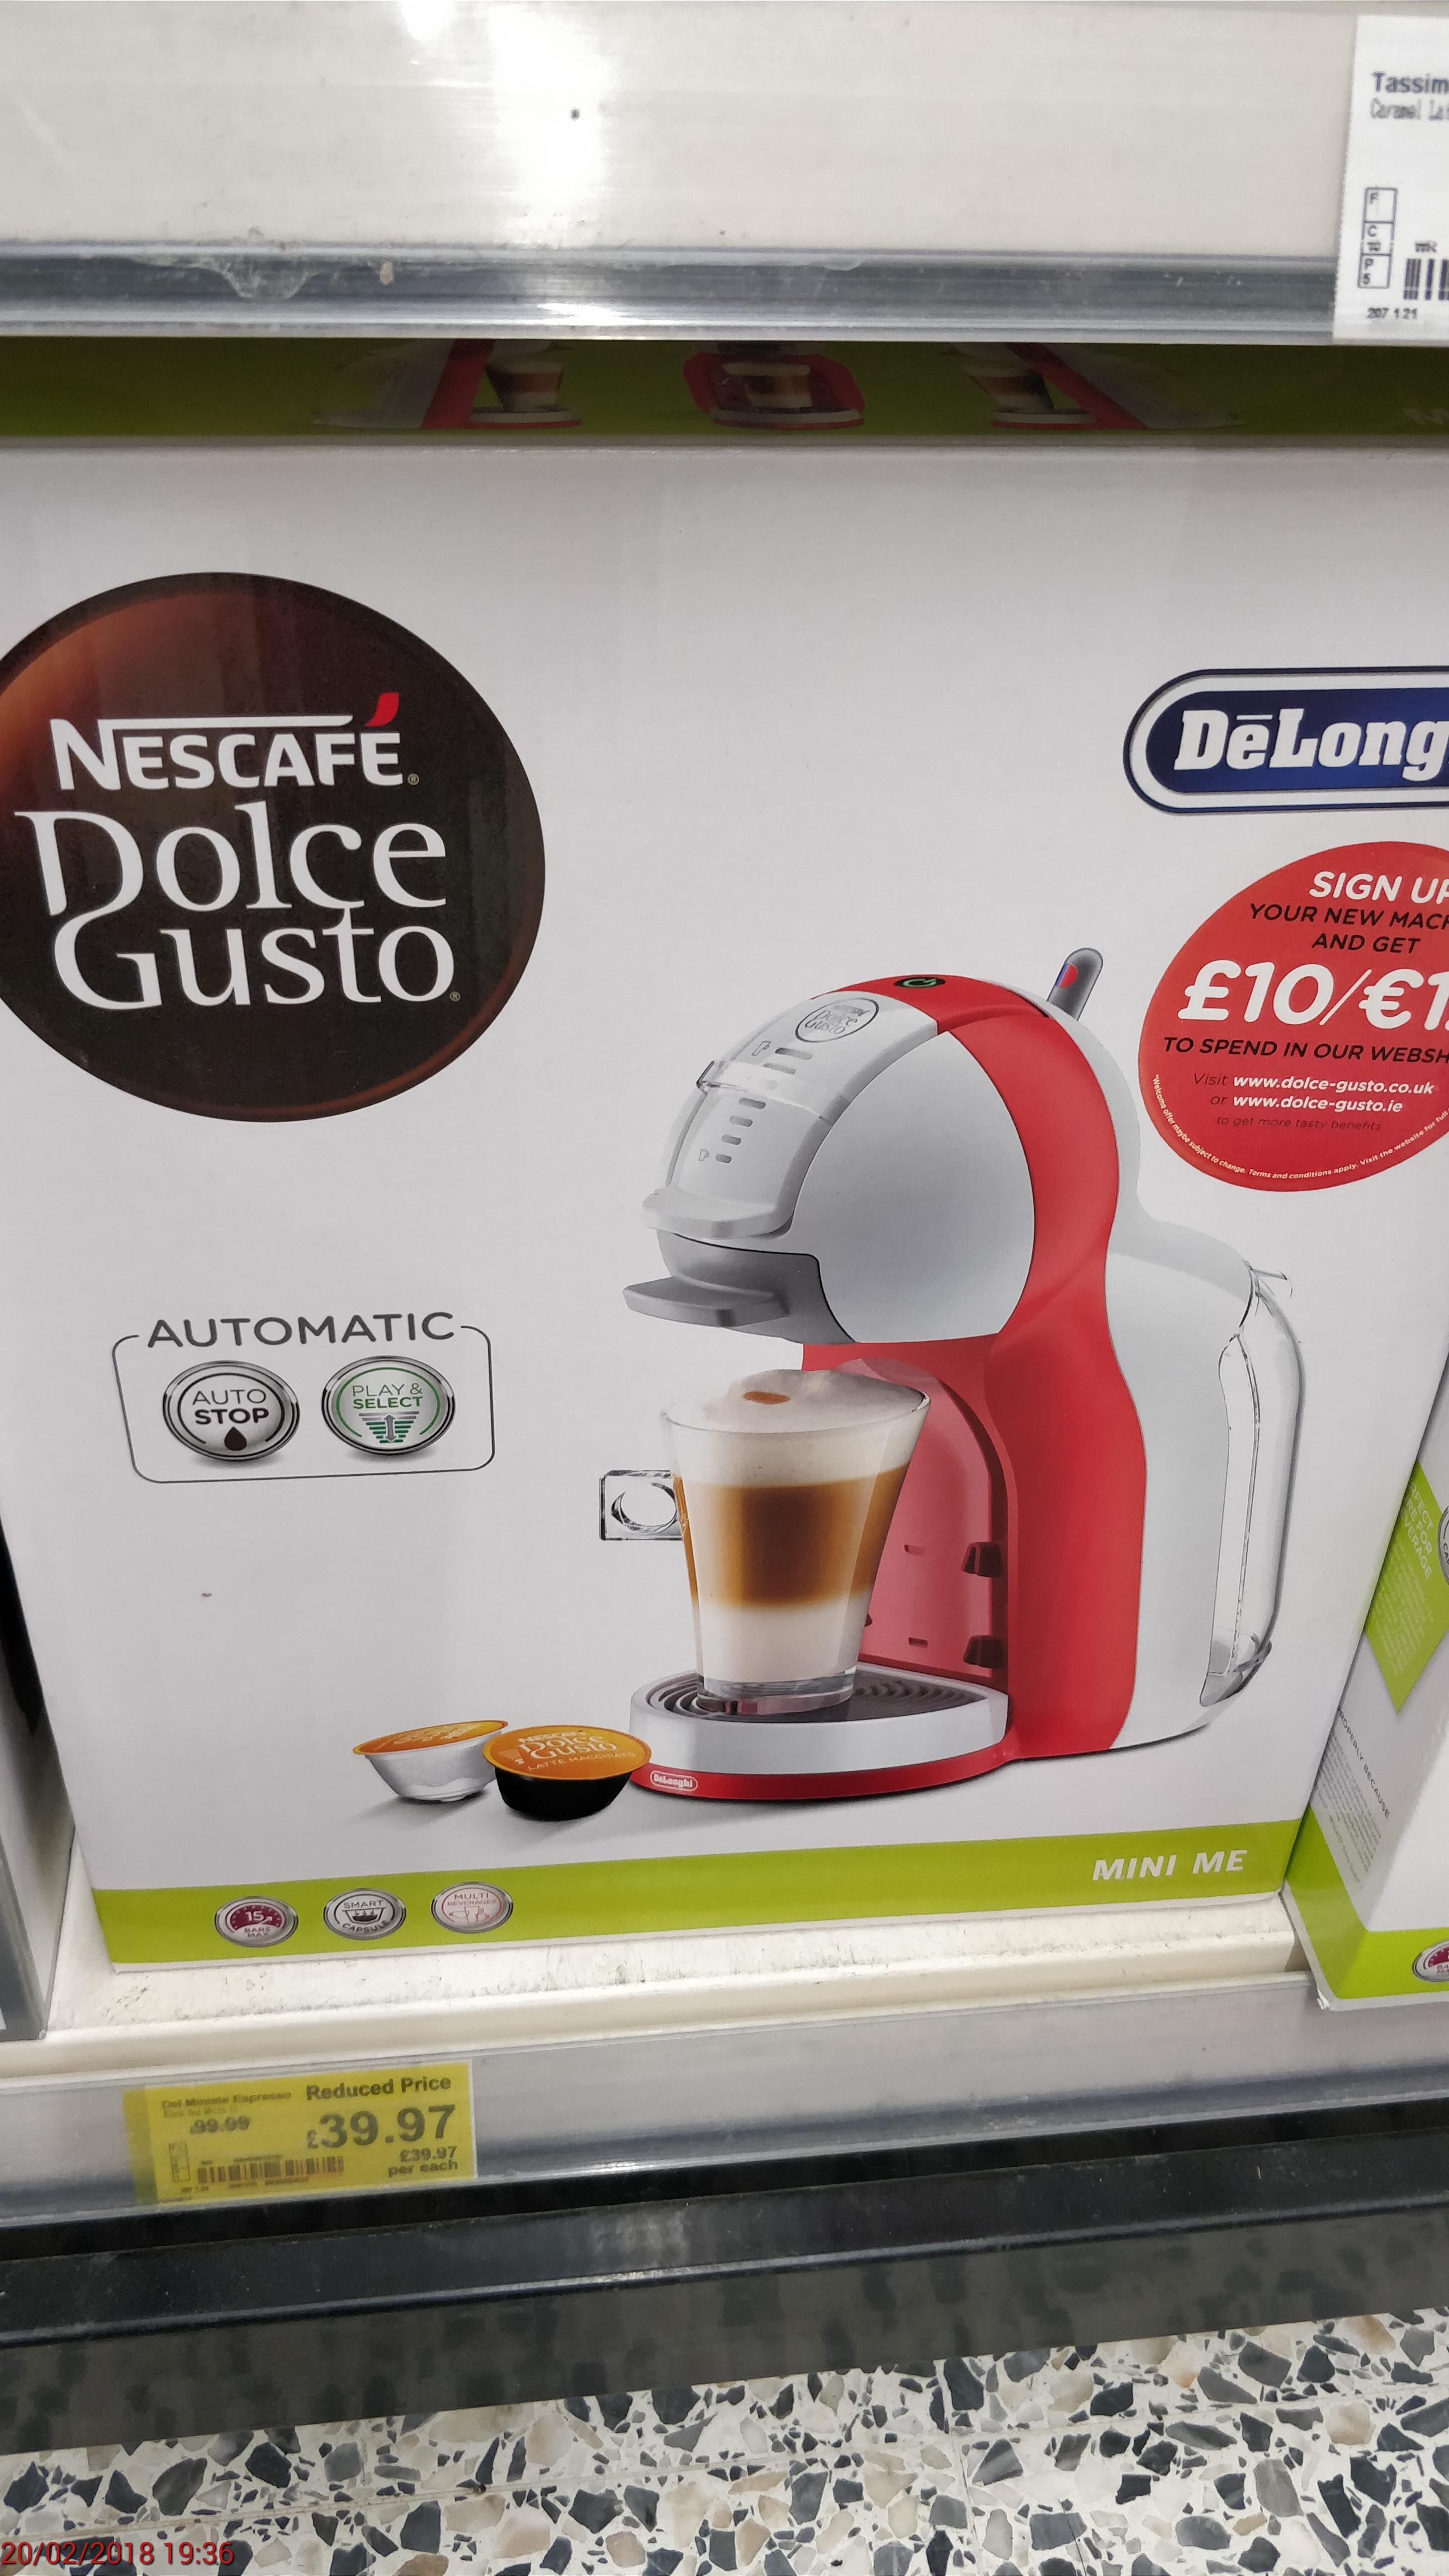 Dolce Gusto Minime Espresso £39.97 - Asda Pilsworth